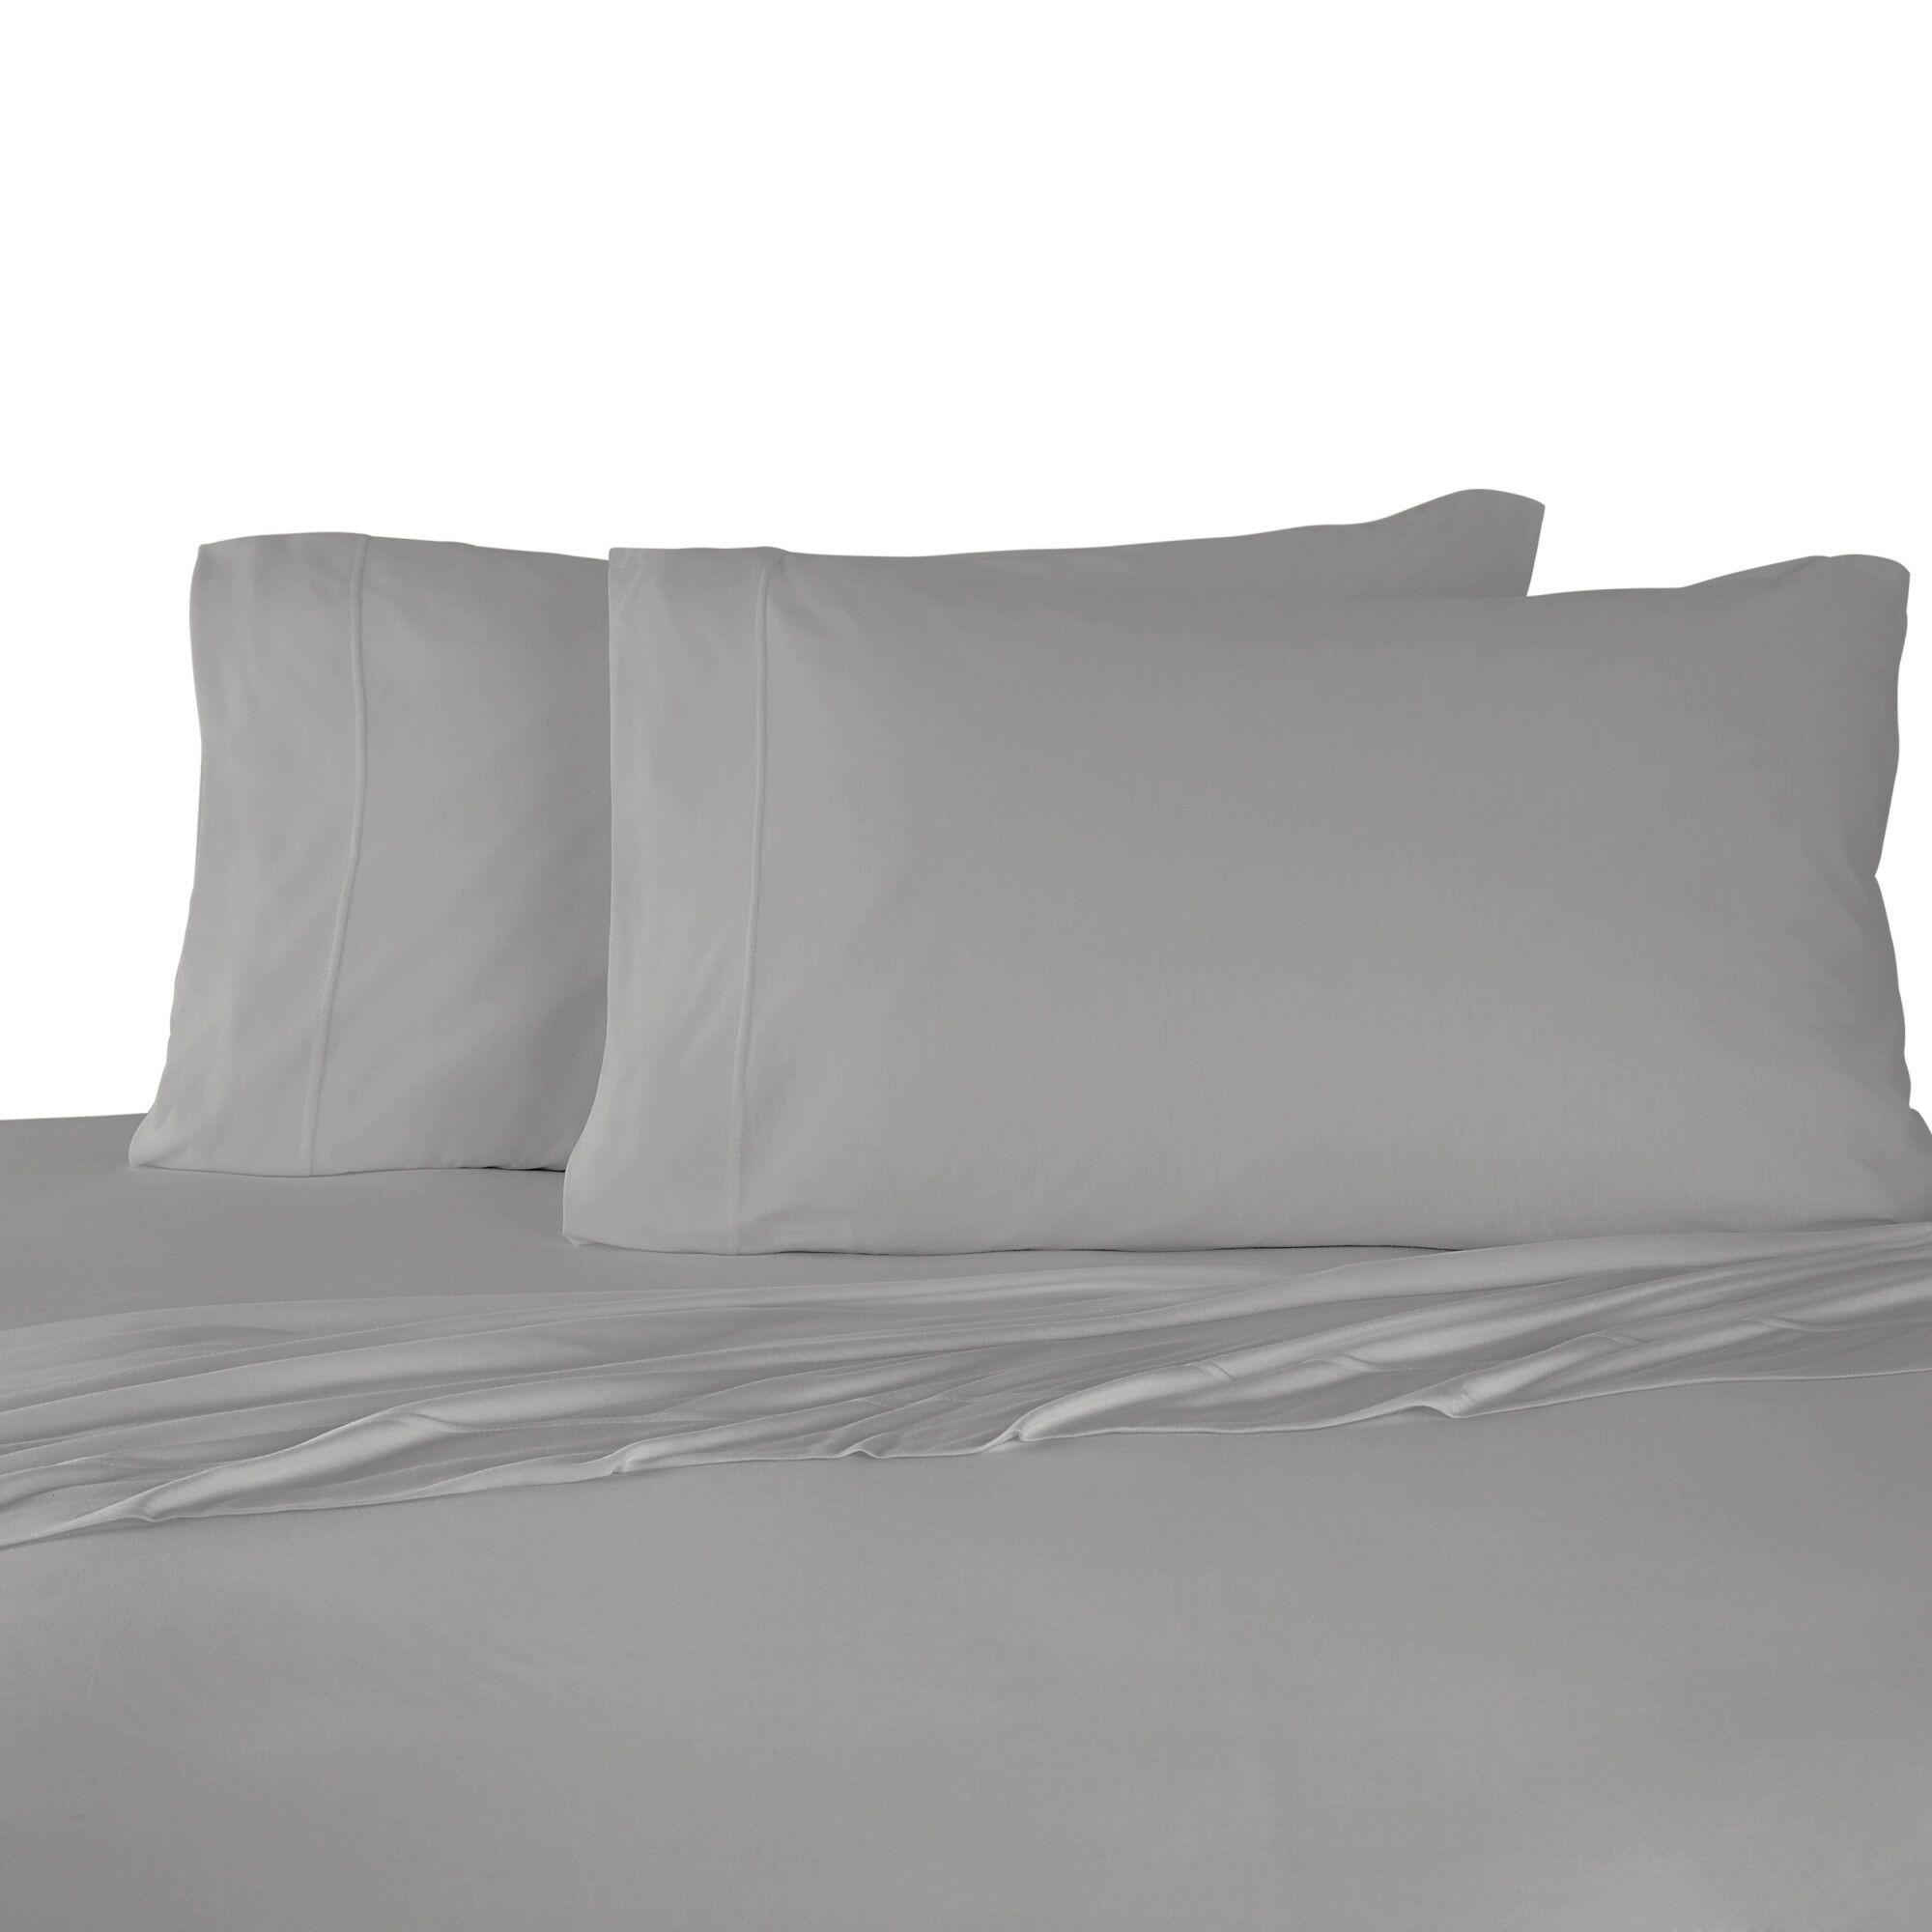 Bare Necessities Jersey Modal Cotton Sheet Set Color: Gray, Size: California king